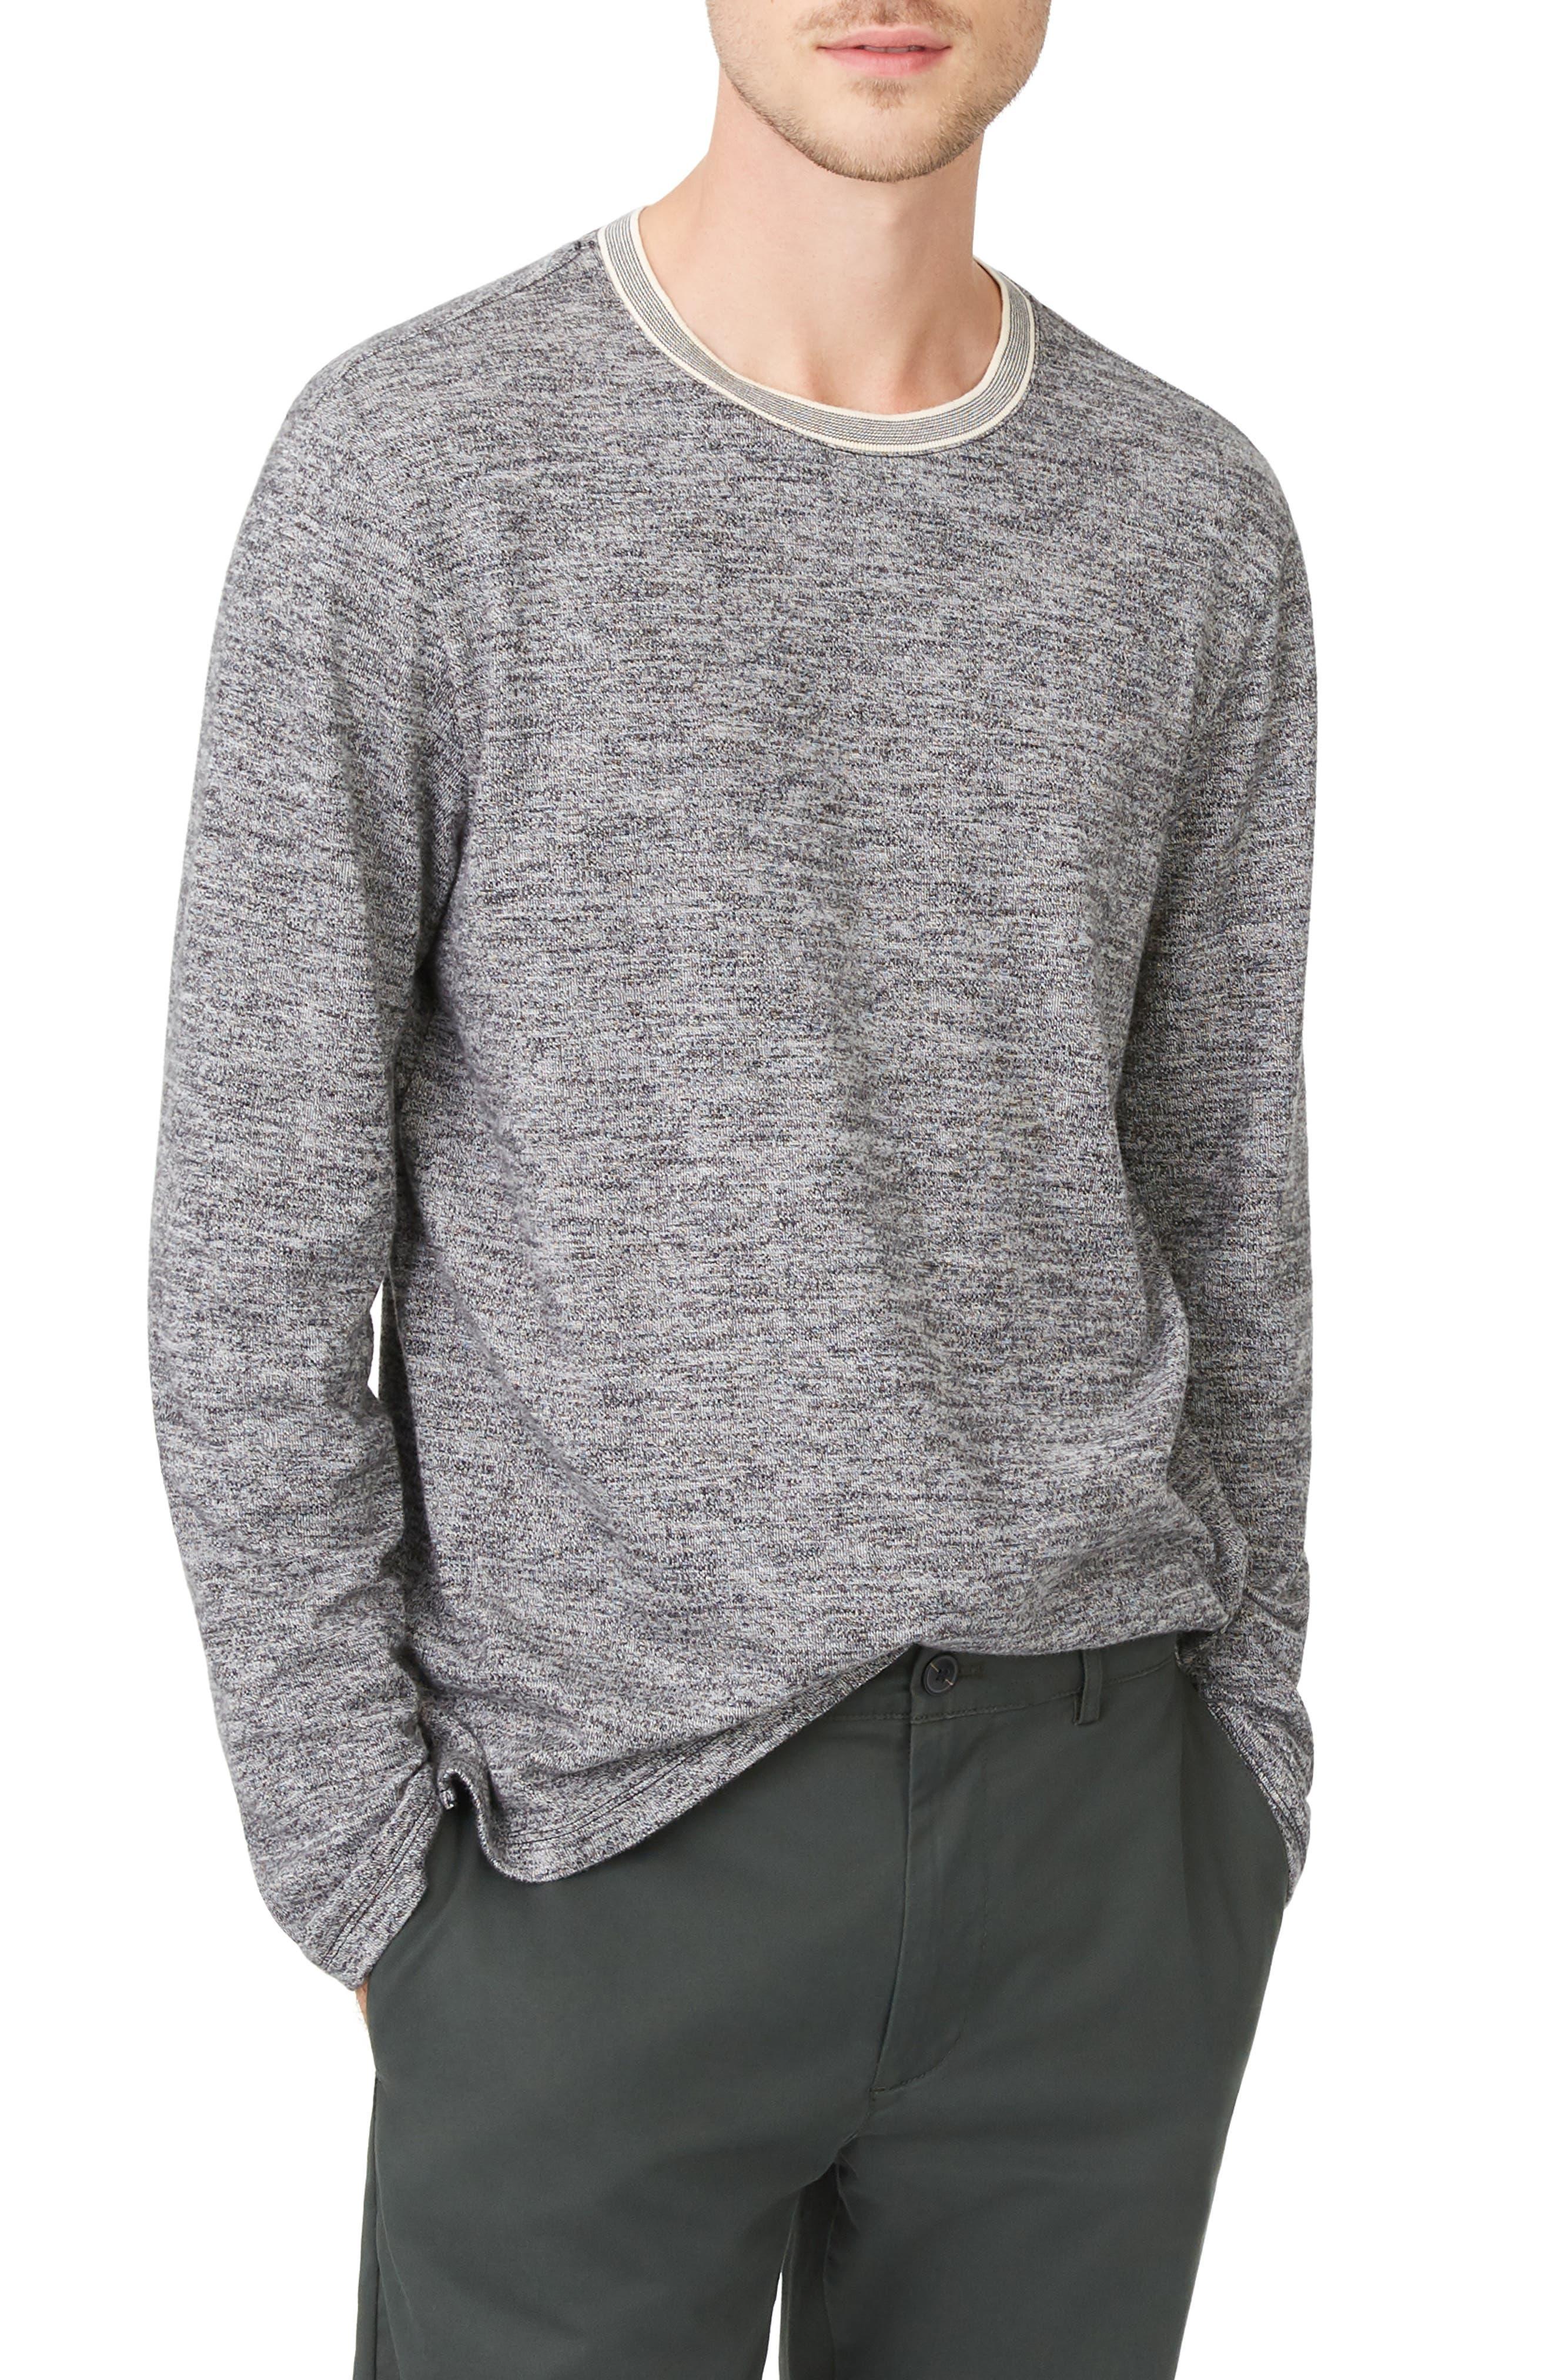 Marled Cotton Crewneck Shirt,                             Main thumbnail 1, color,                             CHARCOAL HEATHER